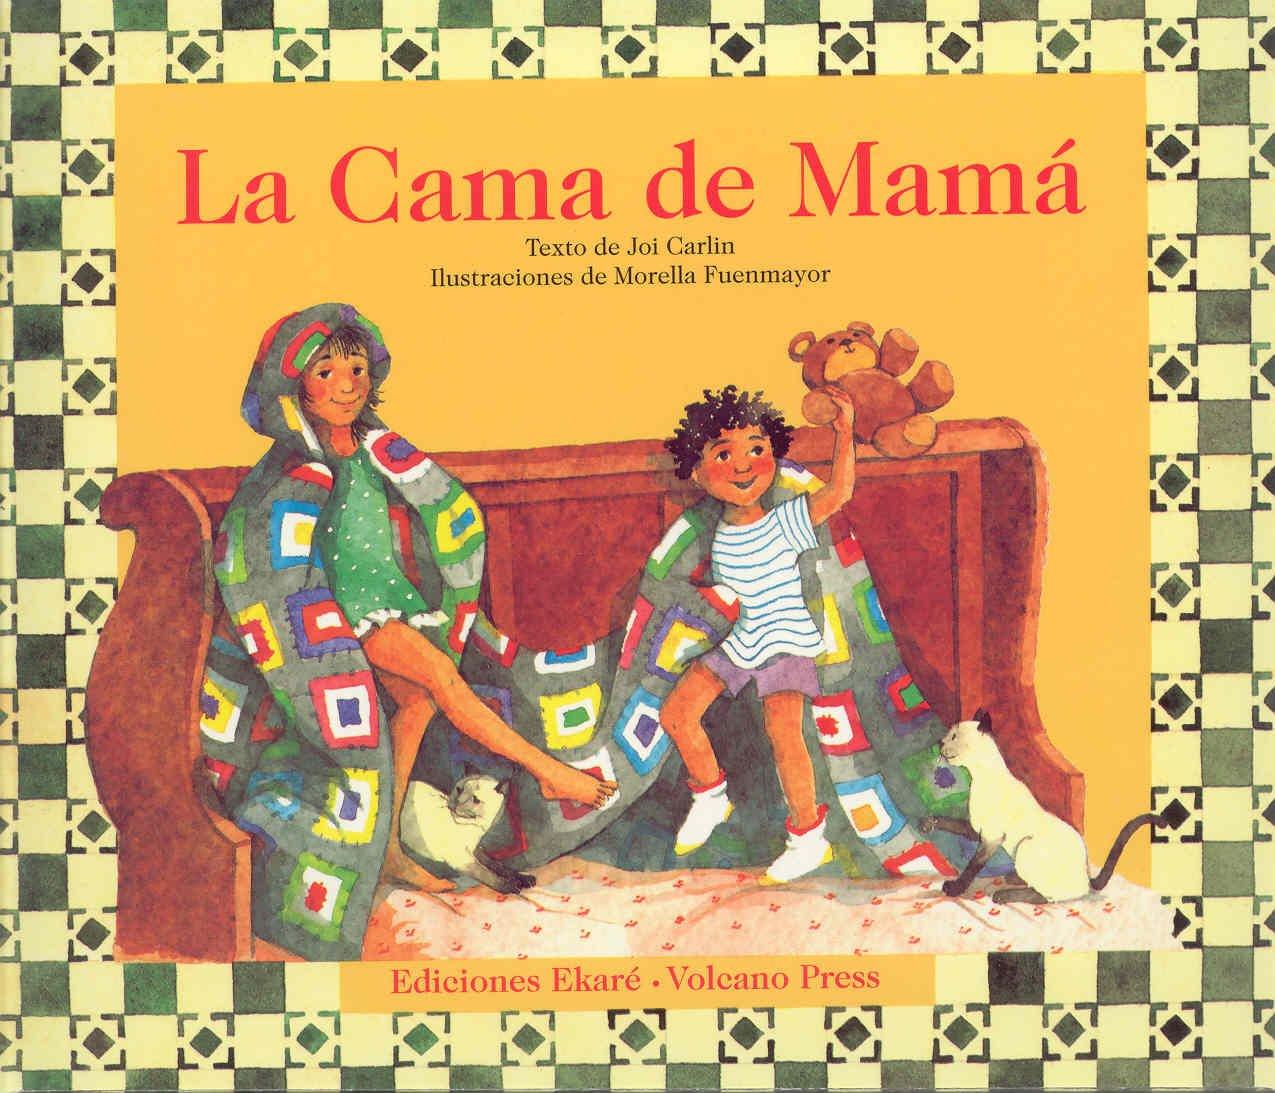 La Cama De Mama (Coleccion Ponte Poronte) (Spanish Edition) (Spanish) Paperback – November 1, 1996